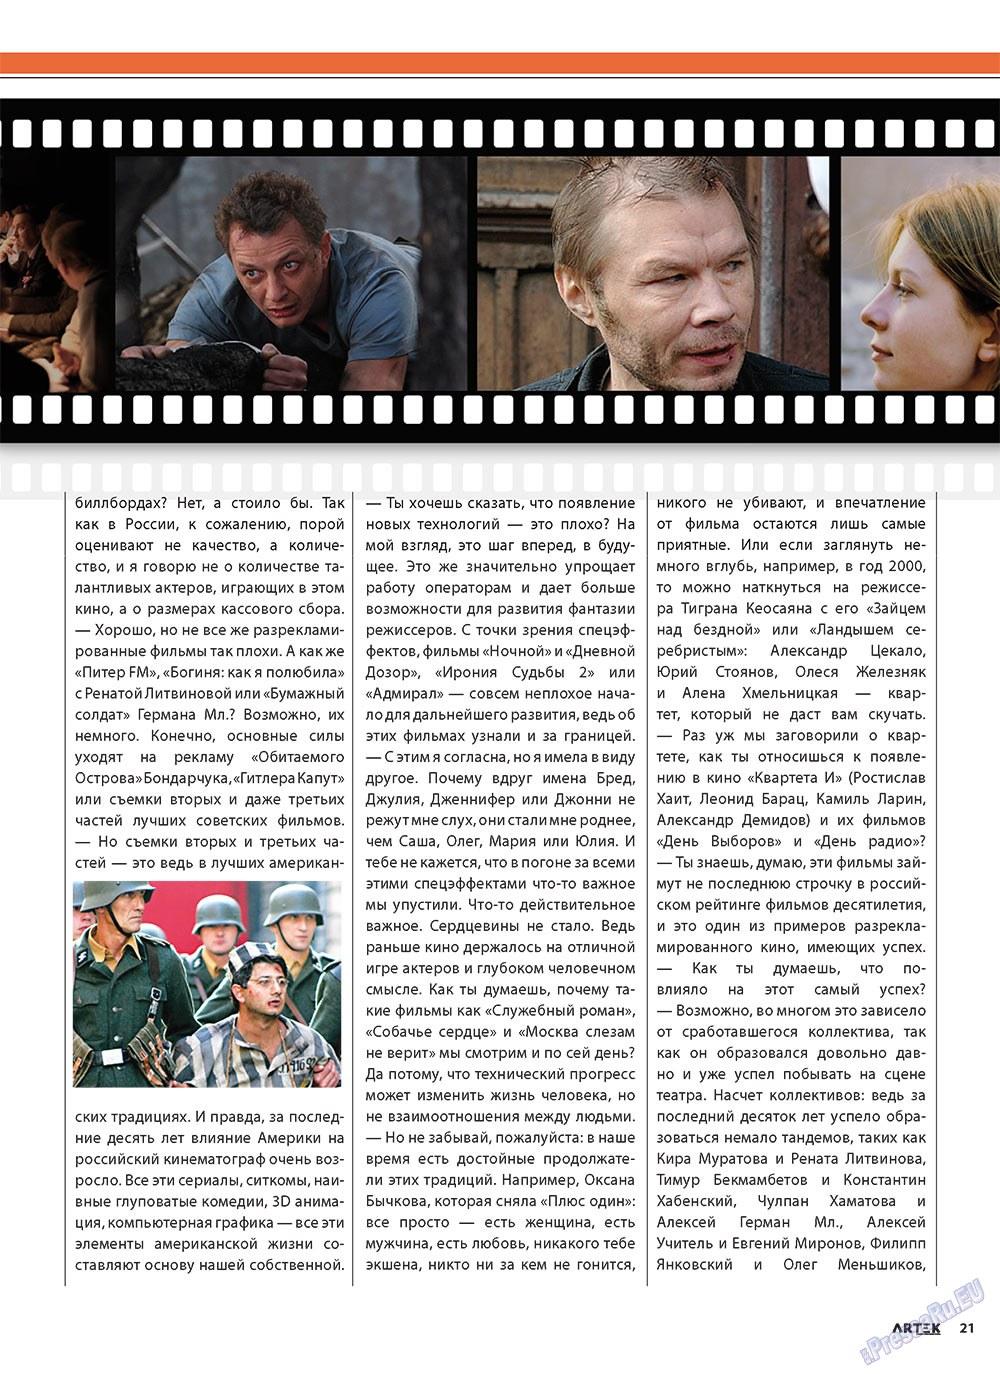 Артек (журнал). 2010 год, номер 6, стр. 23